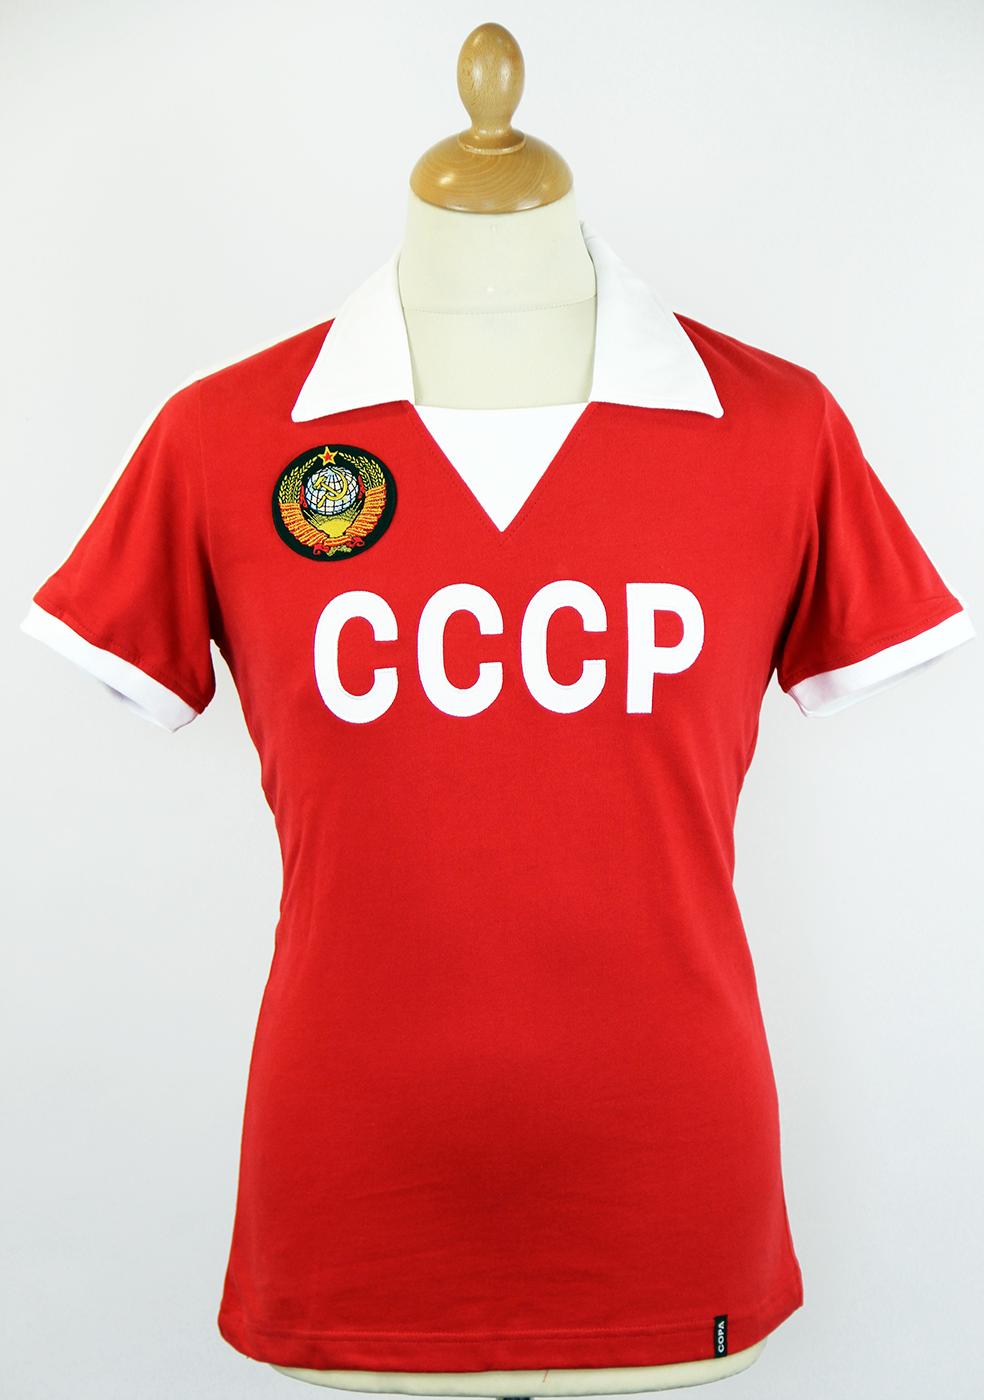 CCCP COPA Retro 1970s USSR Football Shirt (R/W)